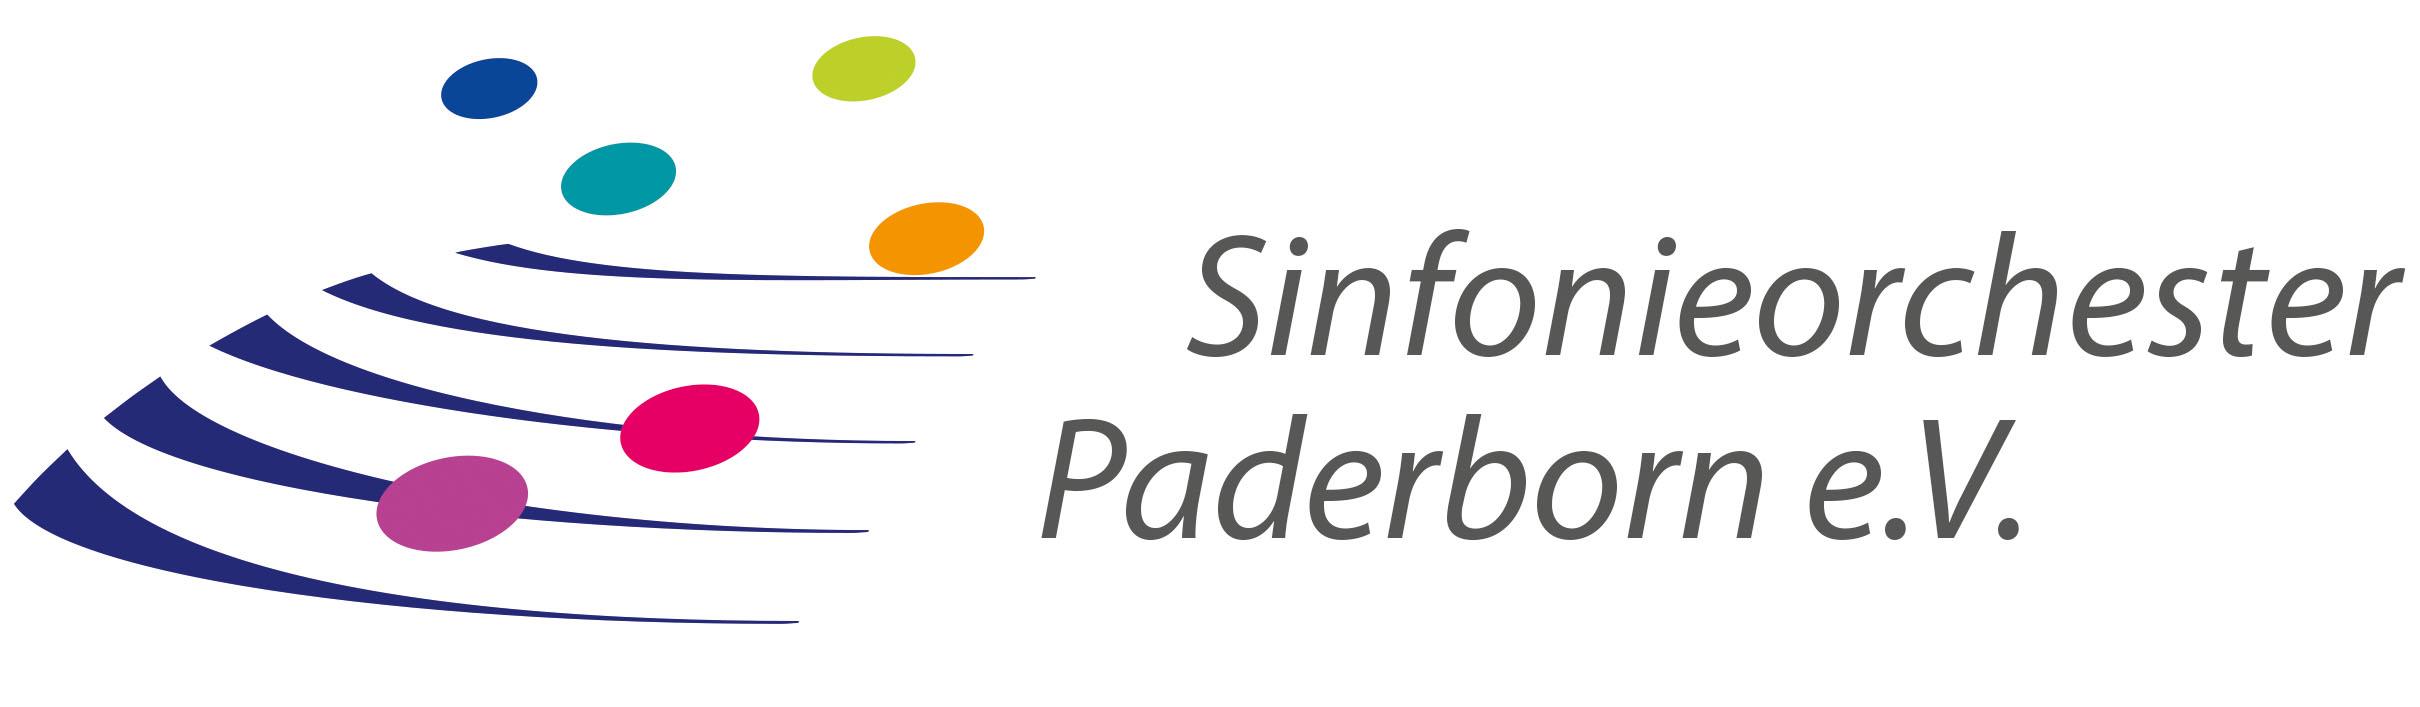 Sinfonieorchester Paderborn e.V.